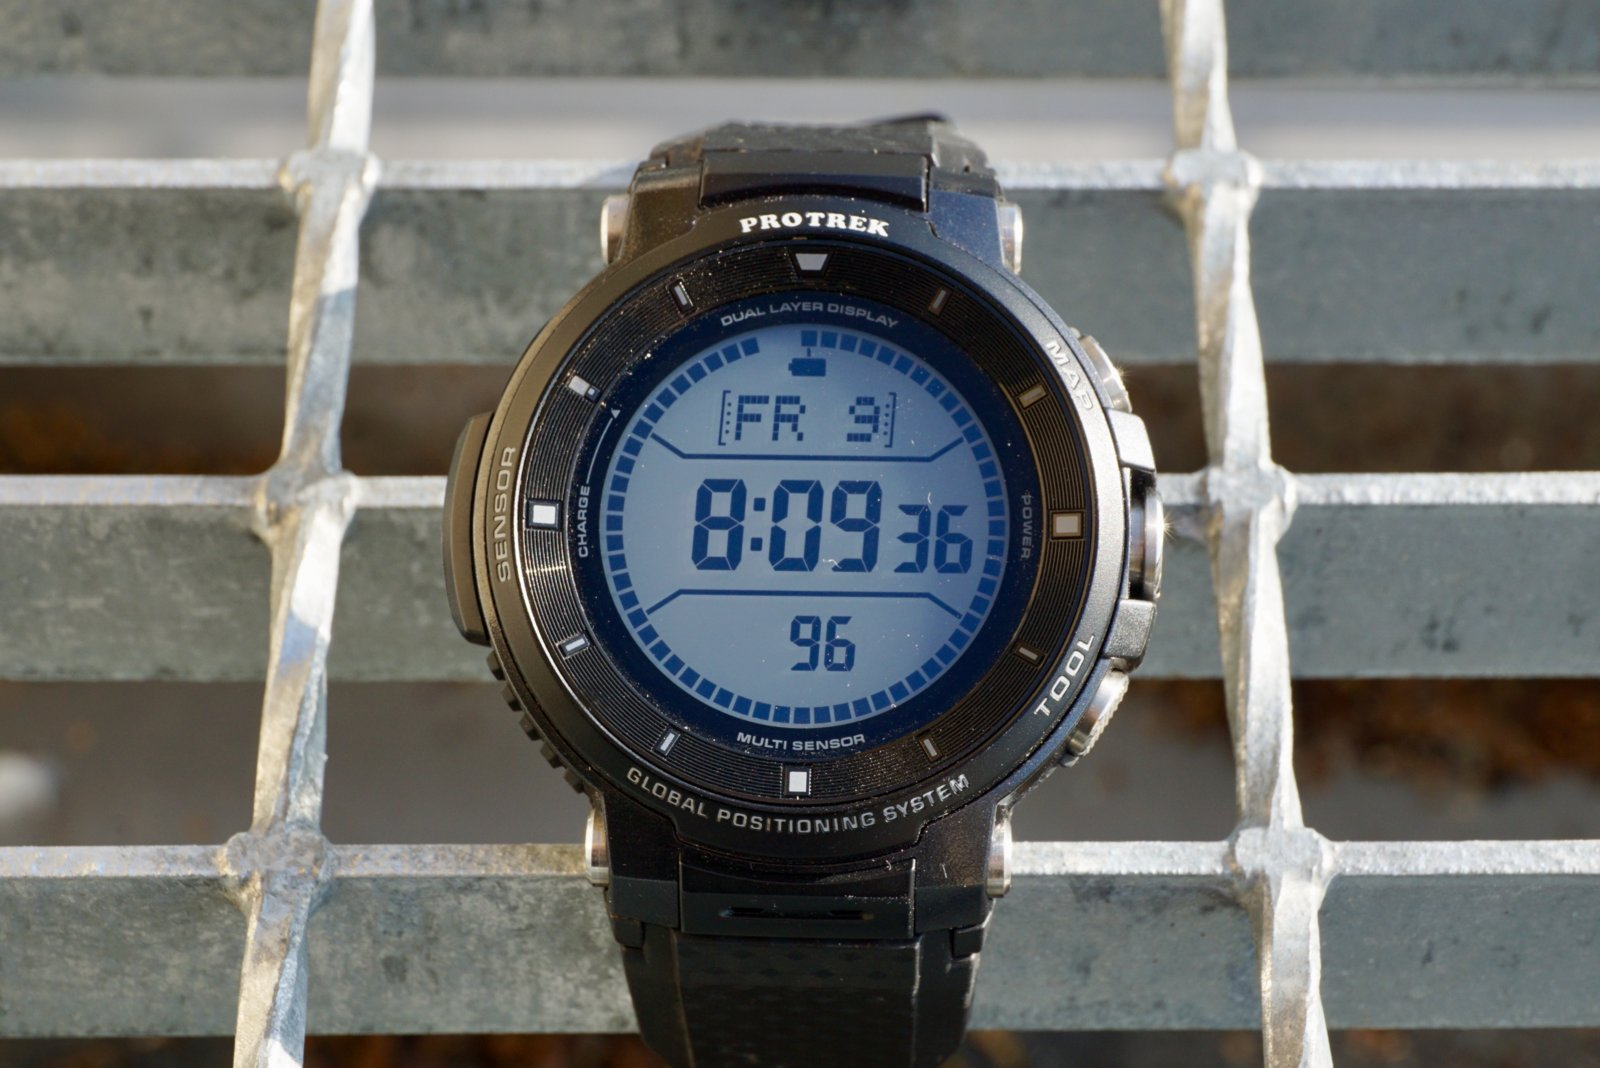 D6F8E1A3-F9E2-4B3C-8F6A-8FBE5A197327.jpeg